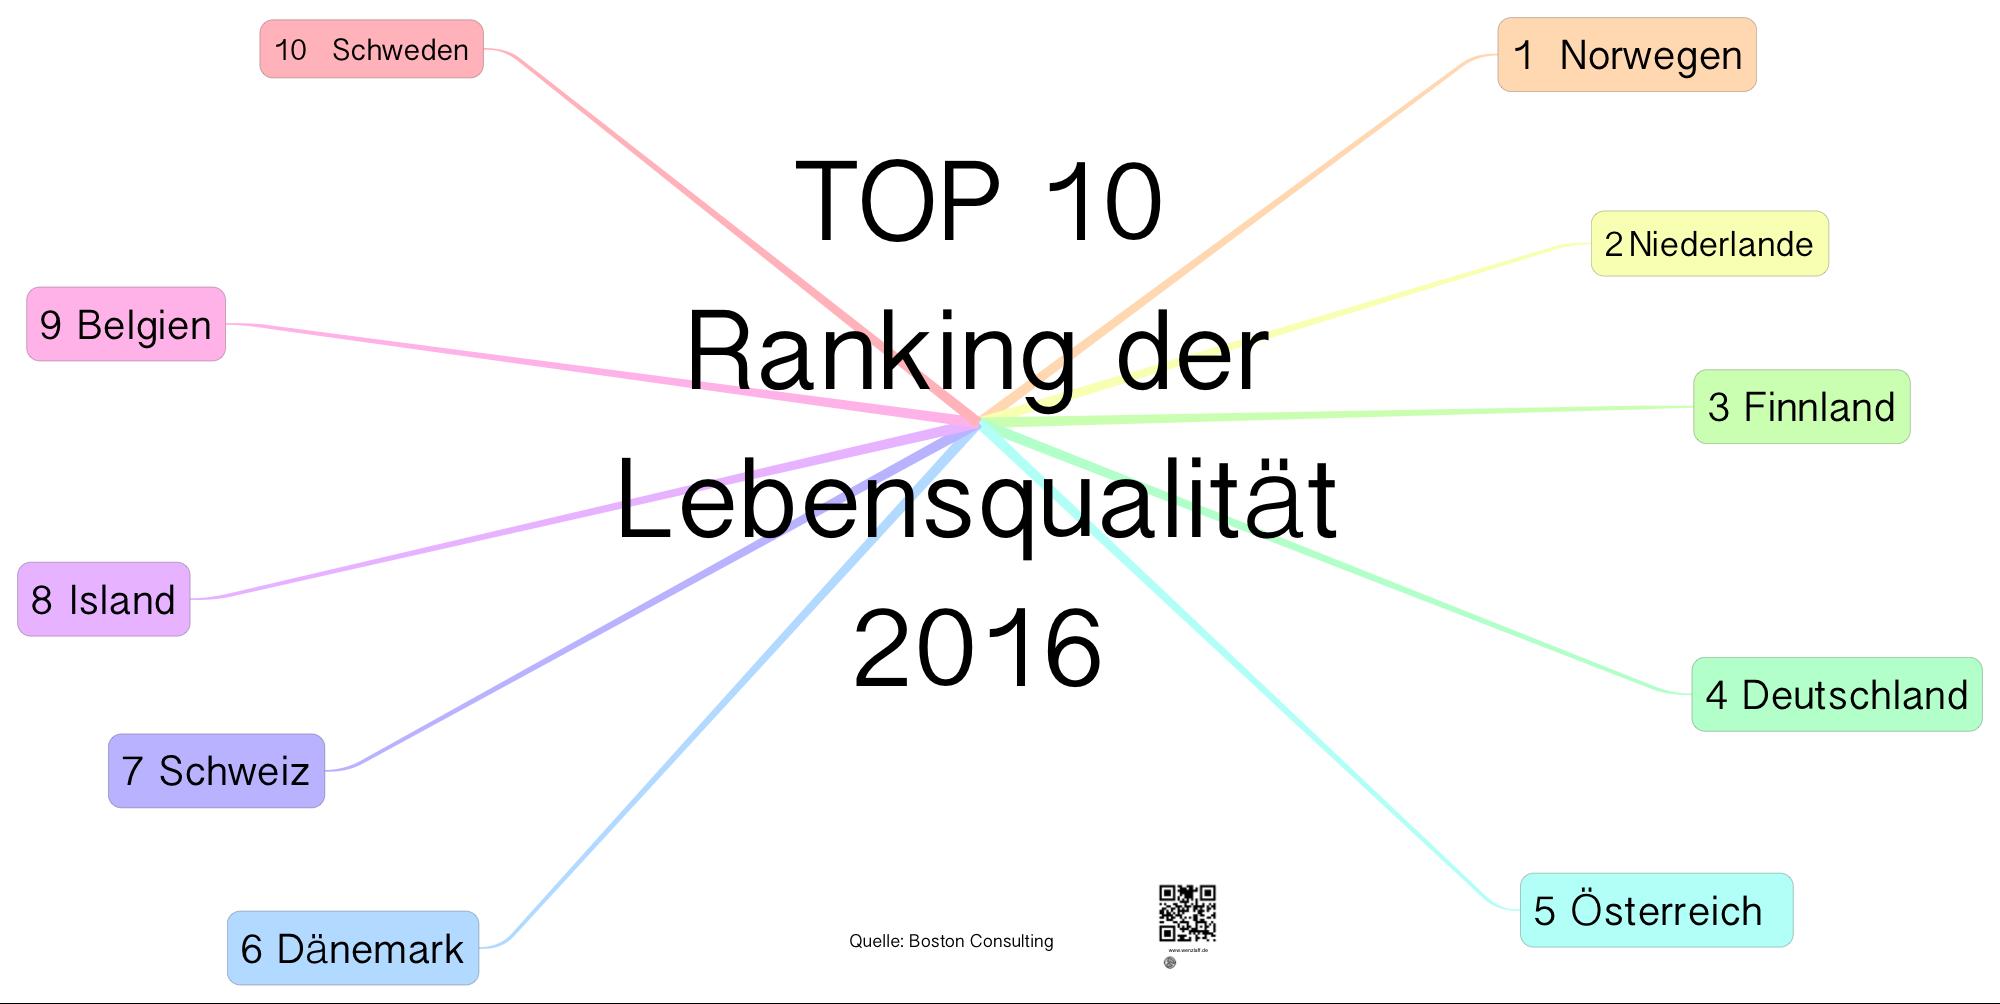 ranking-der-lebensqualitaet